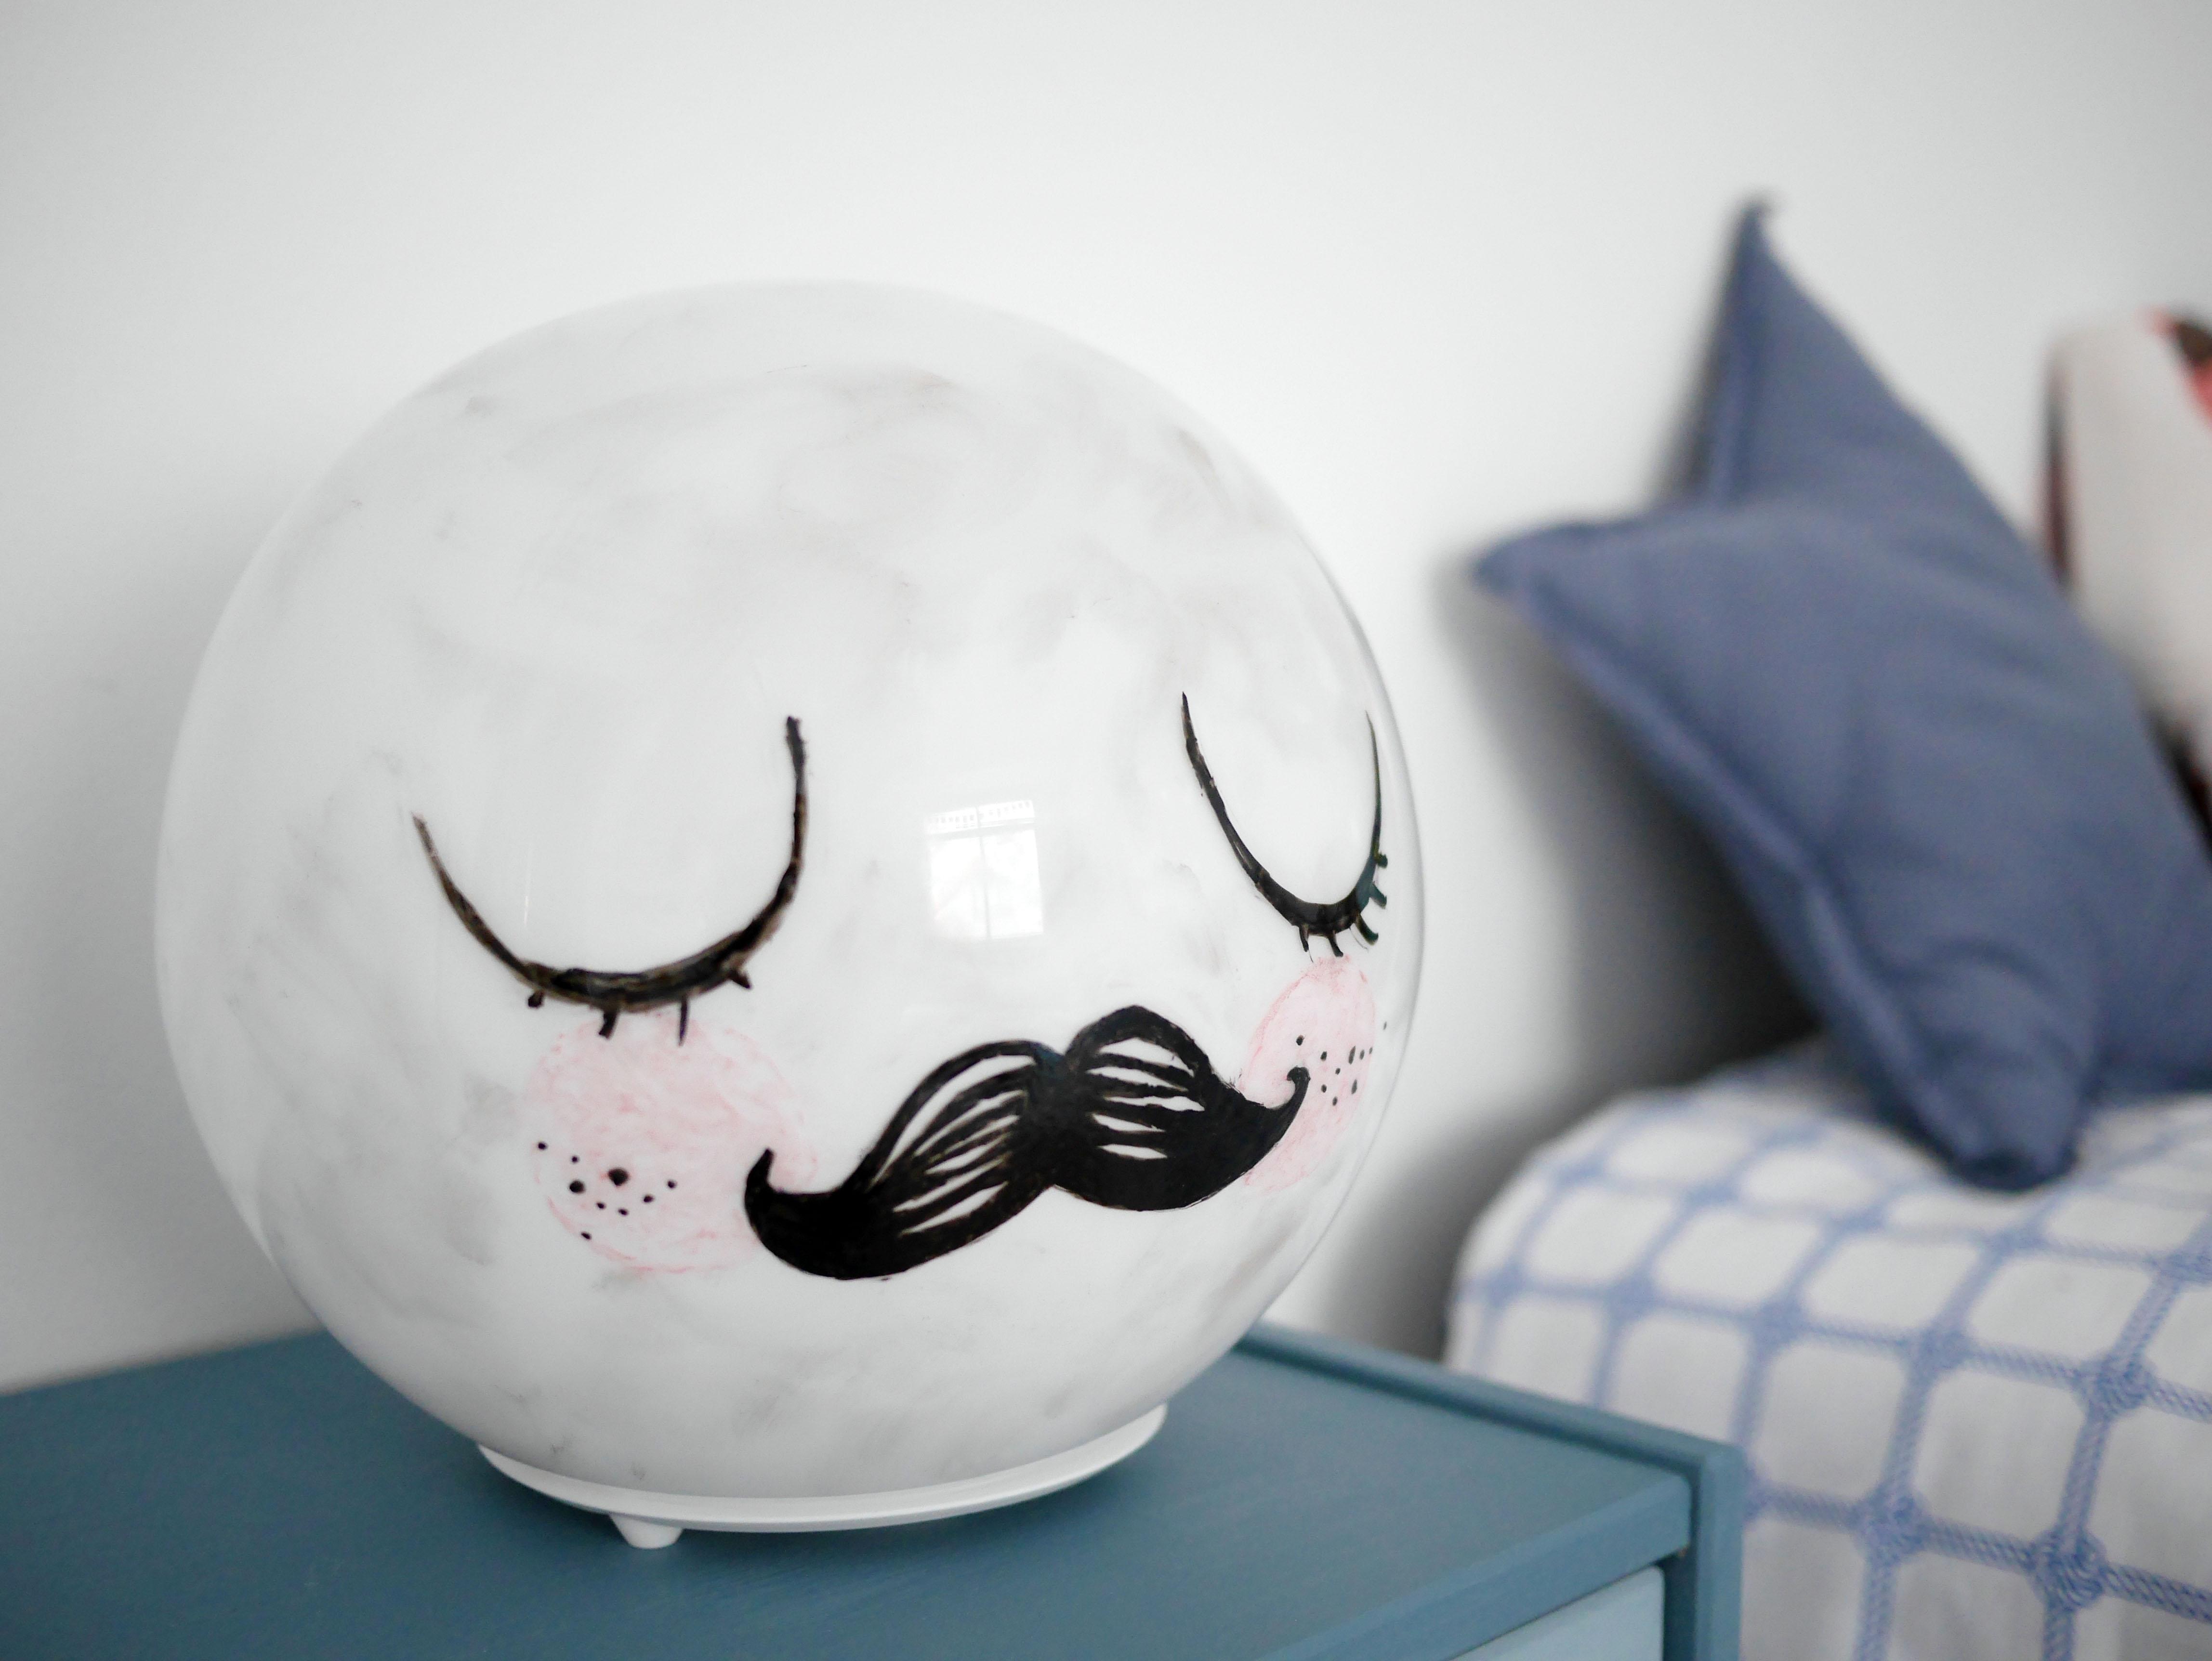 l mpara fado ikea deco ikea quiero una casa pinterest baballa. Black Bedroom Furniture Sets. Home Design Ideas